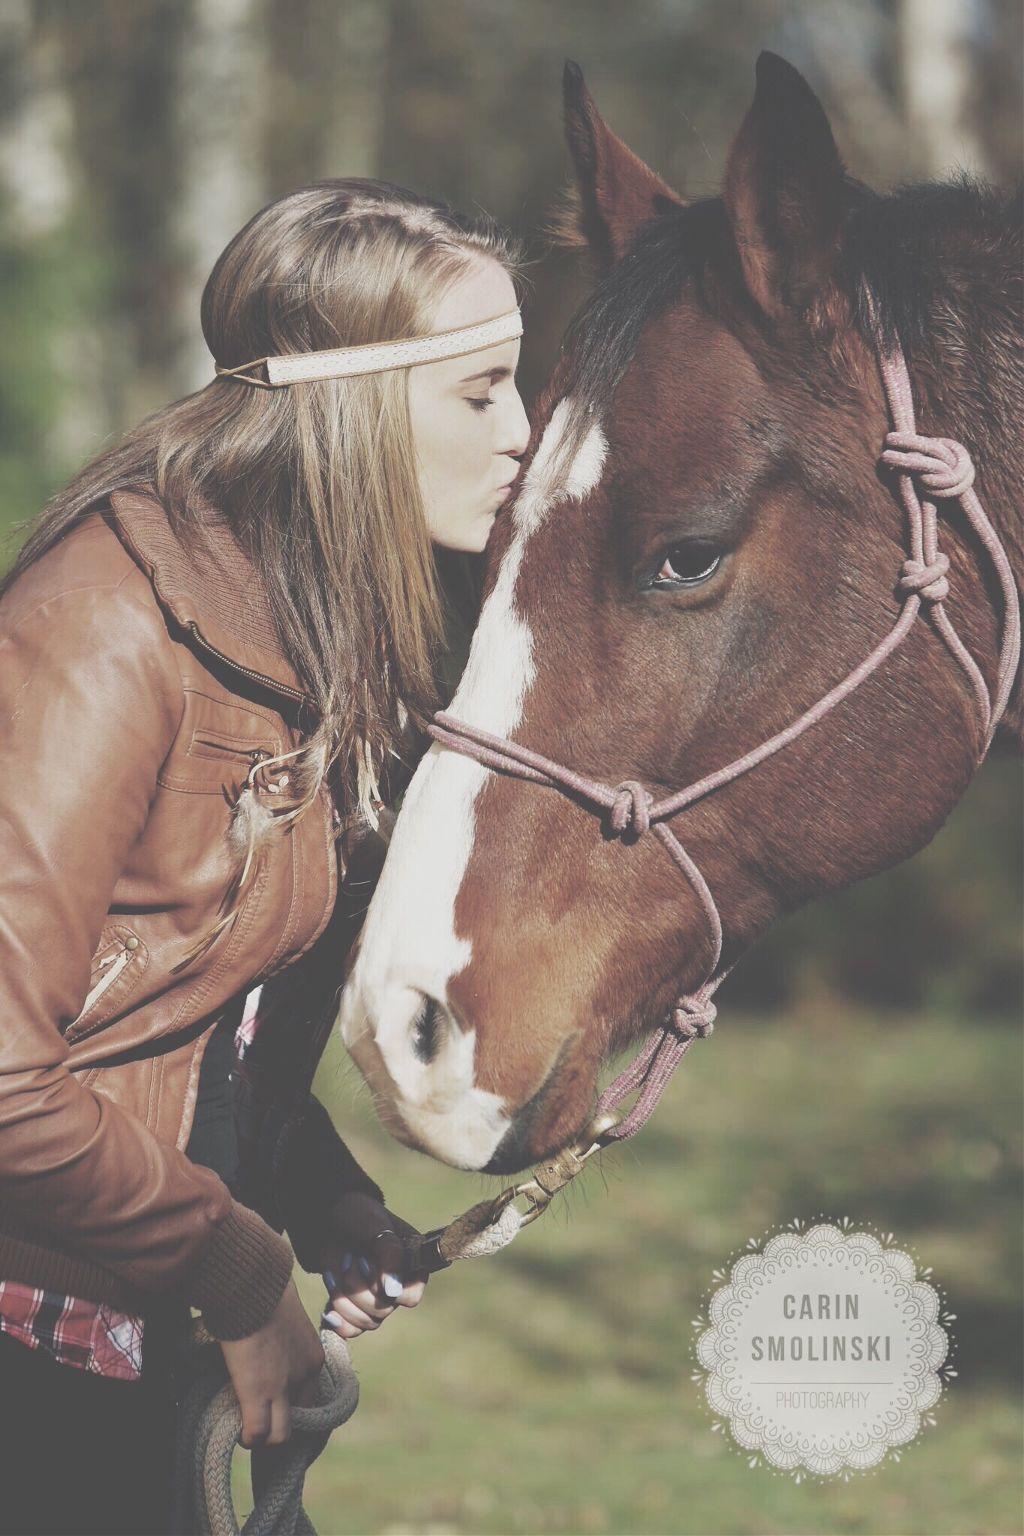 beautiful photoshoot with my boy 💙